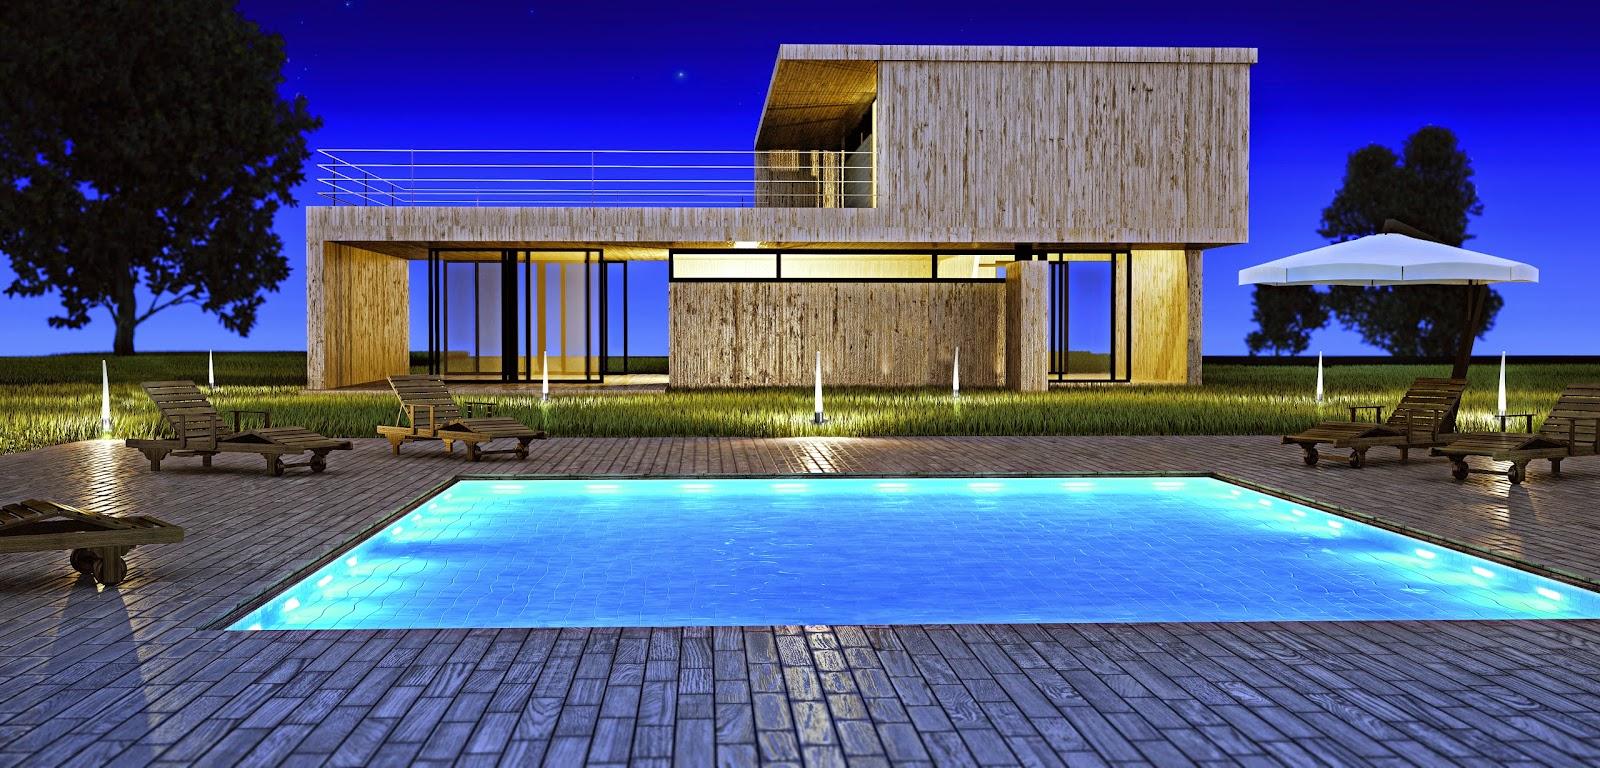 Iluminaci n para exterior consejos y modelos para - Iluminacion para terrazas ...